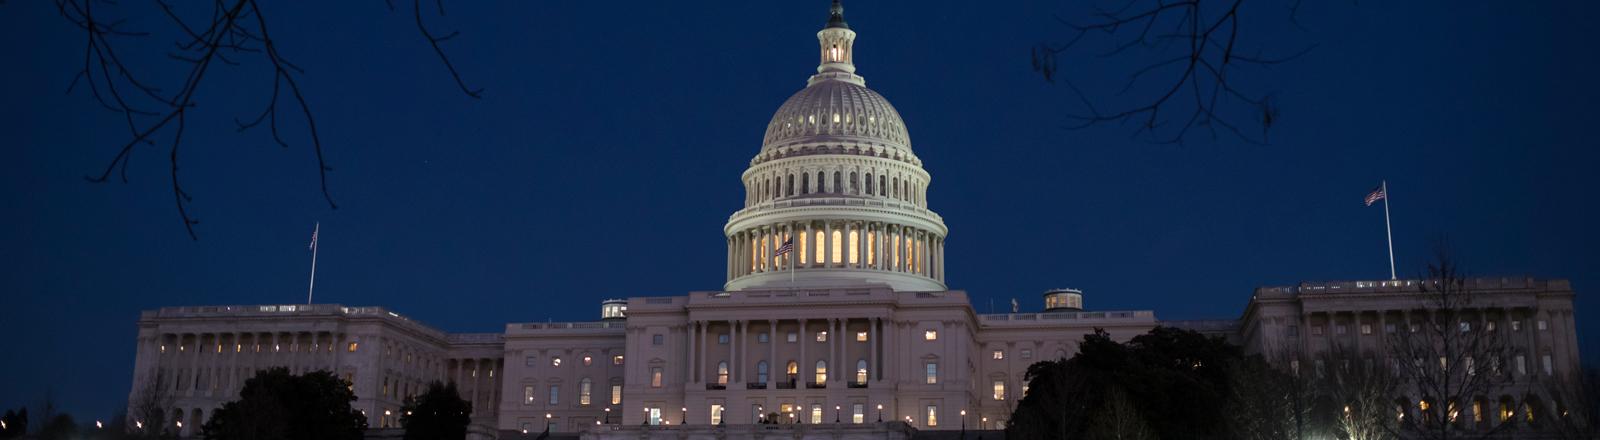 US-Kapitol bei Nacht